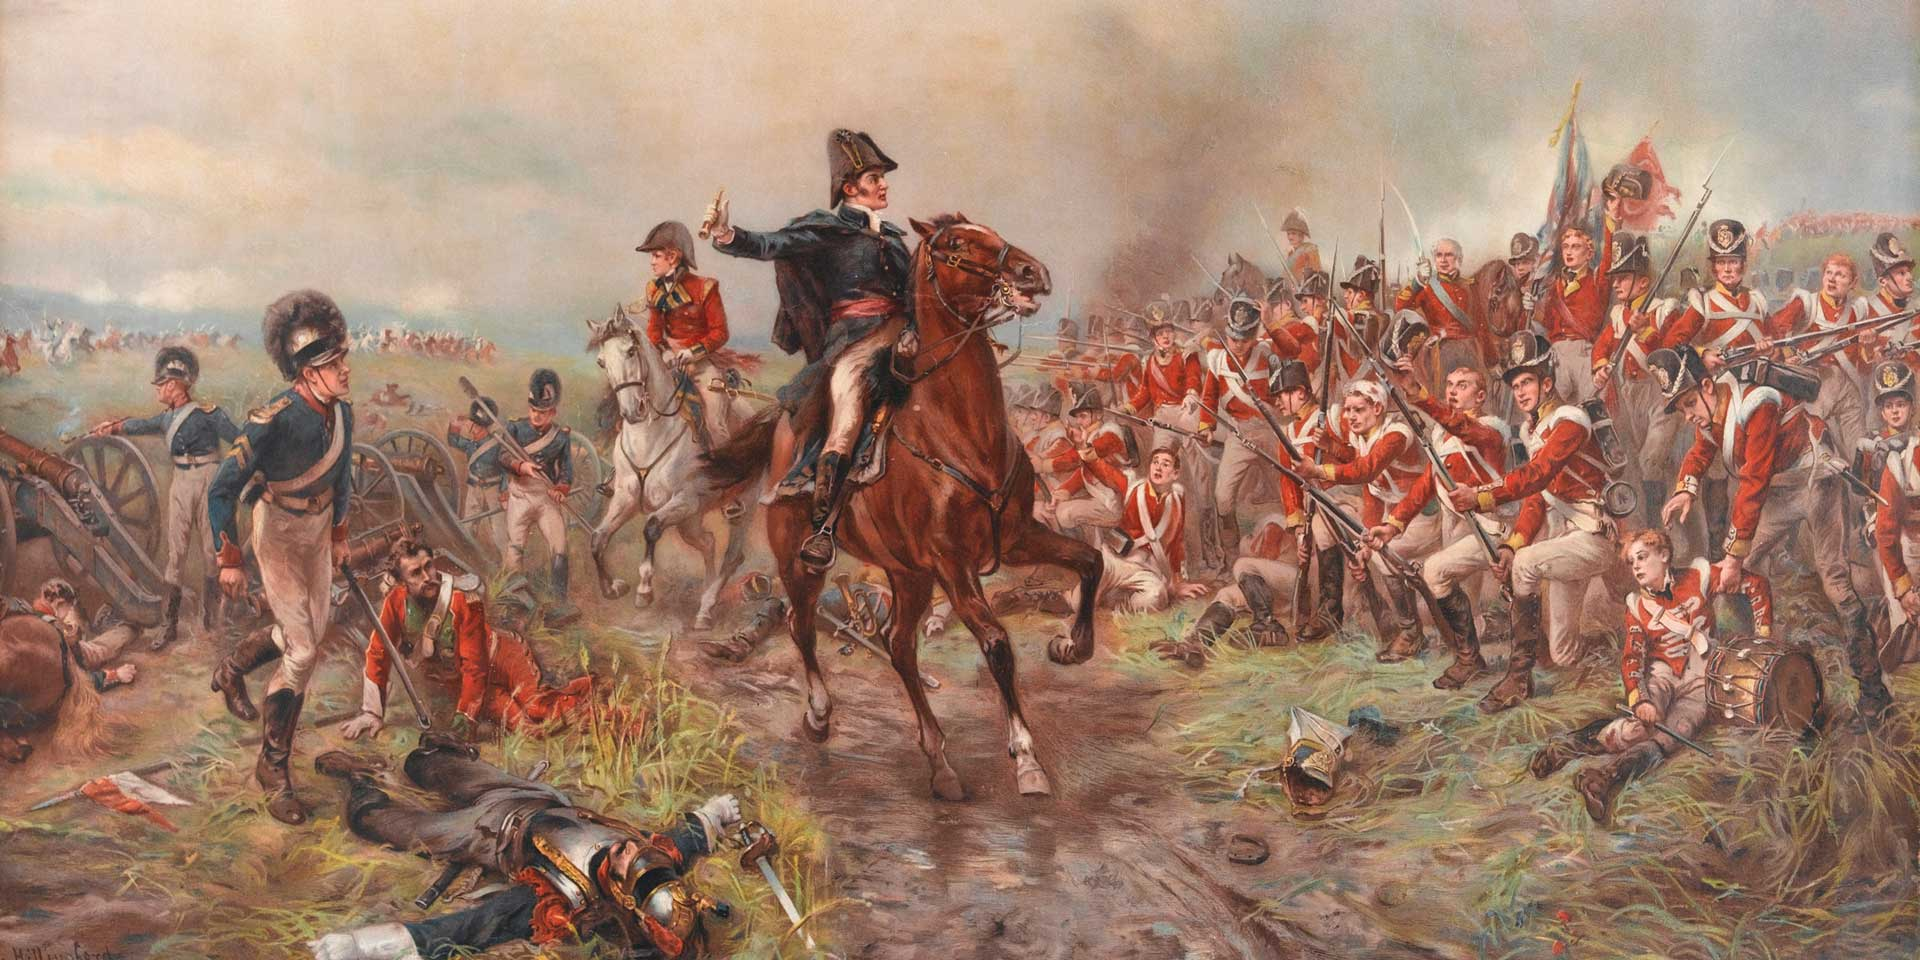 The Duke of Wellington at Waterloo, 1815